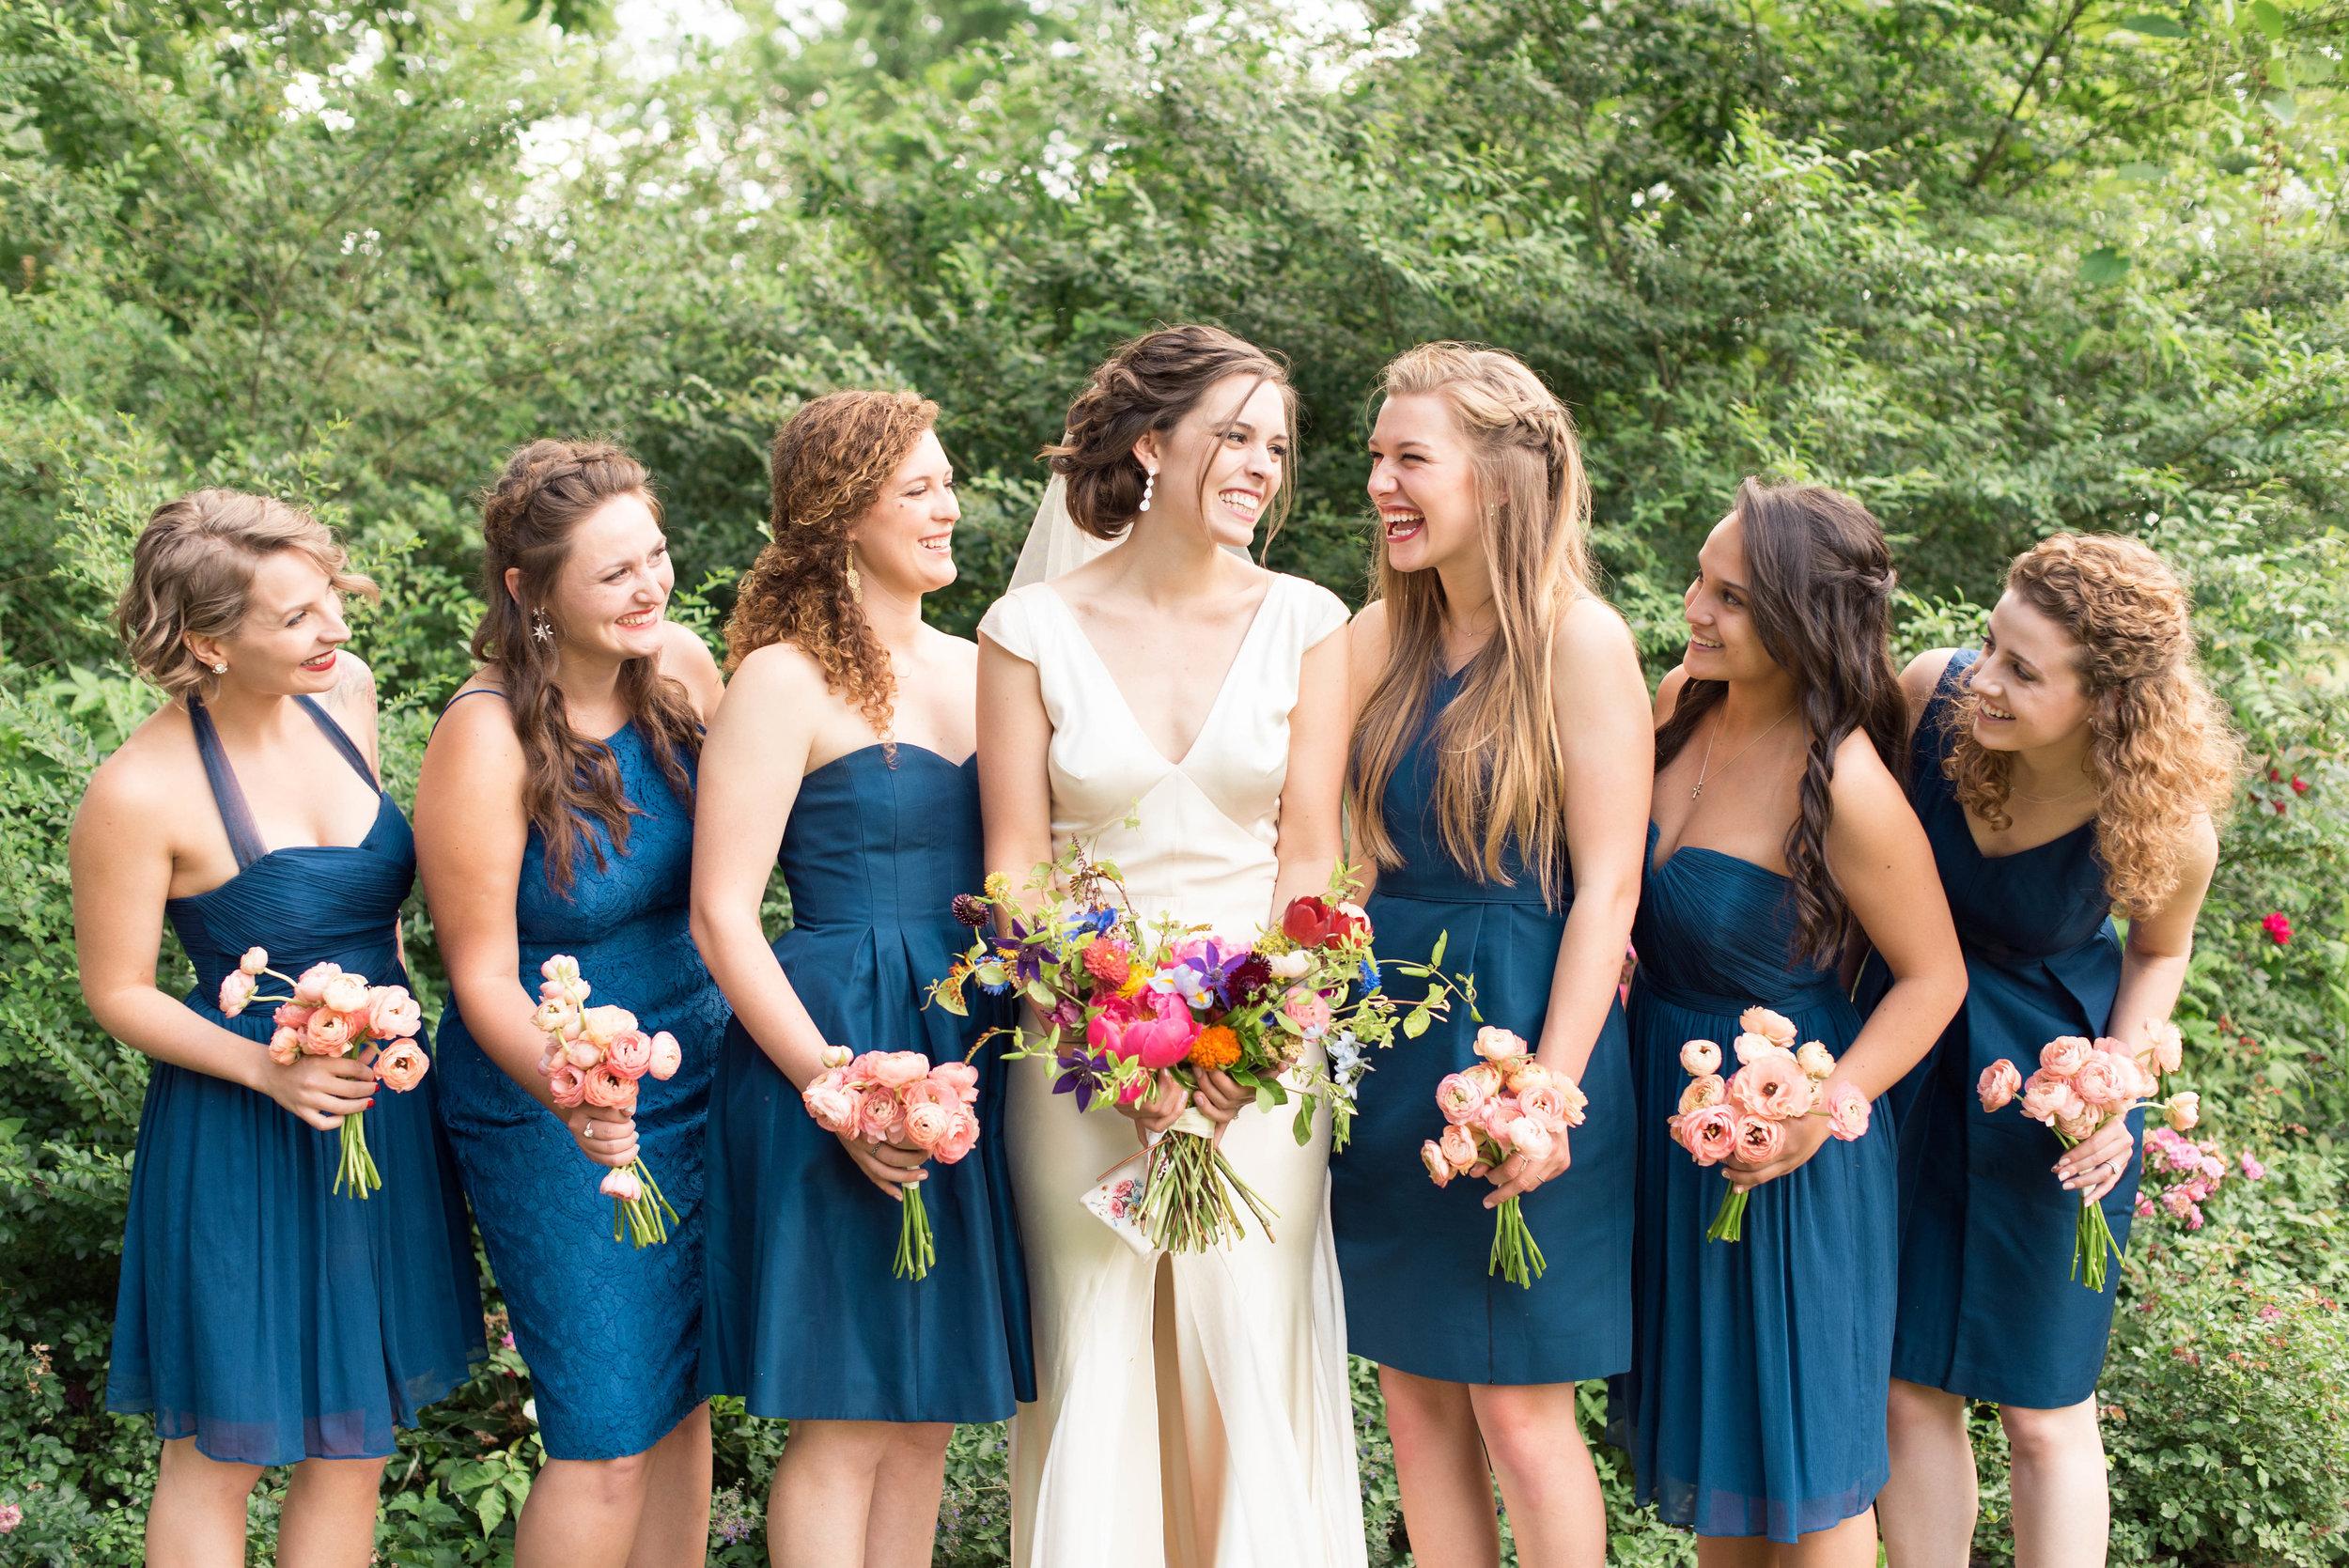 Lush, bright bridal bouquet // Peach ranunculus bridesmaid bouquets // Chagall Painting Inspired Wedding Flowers